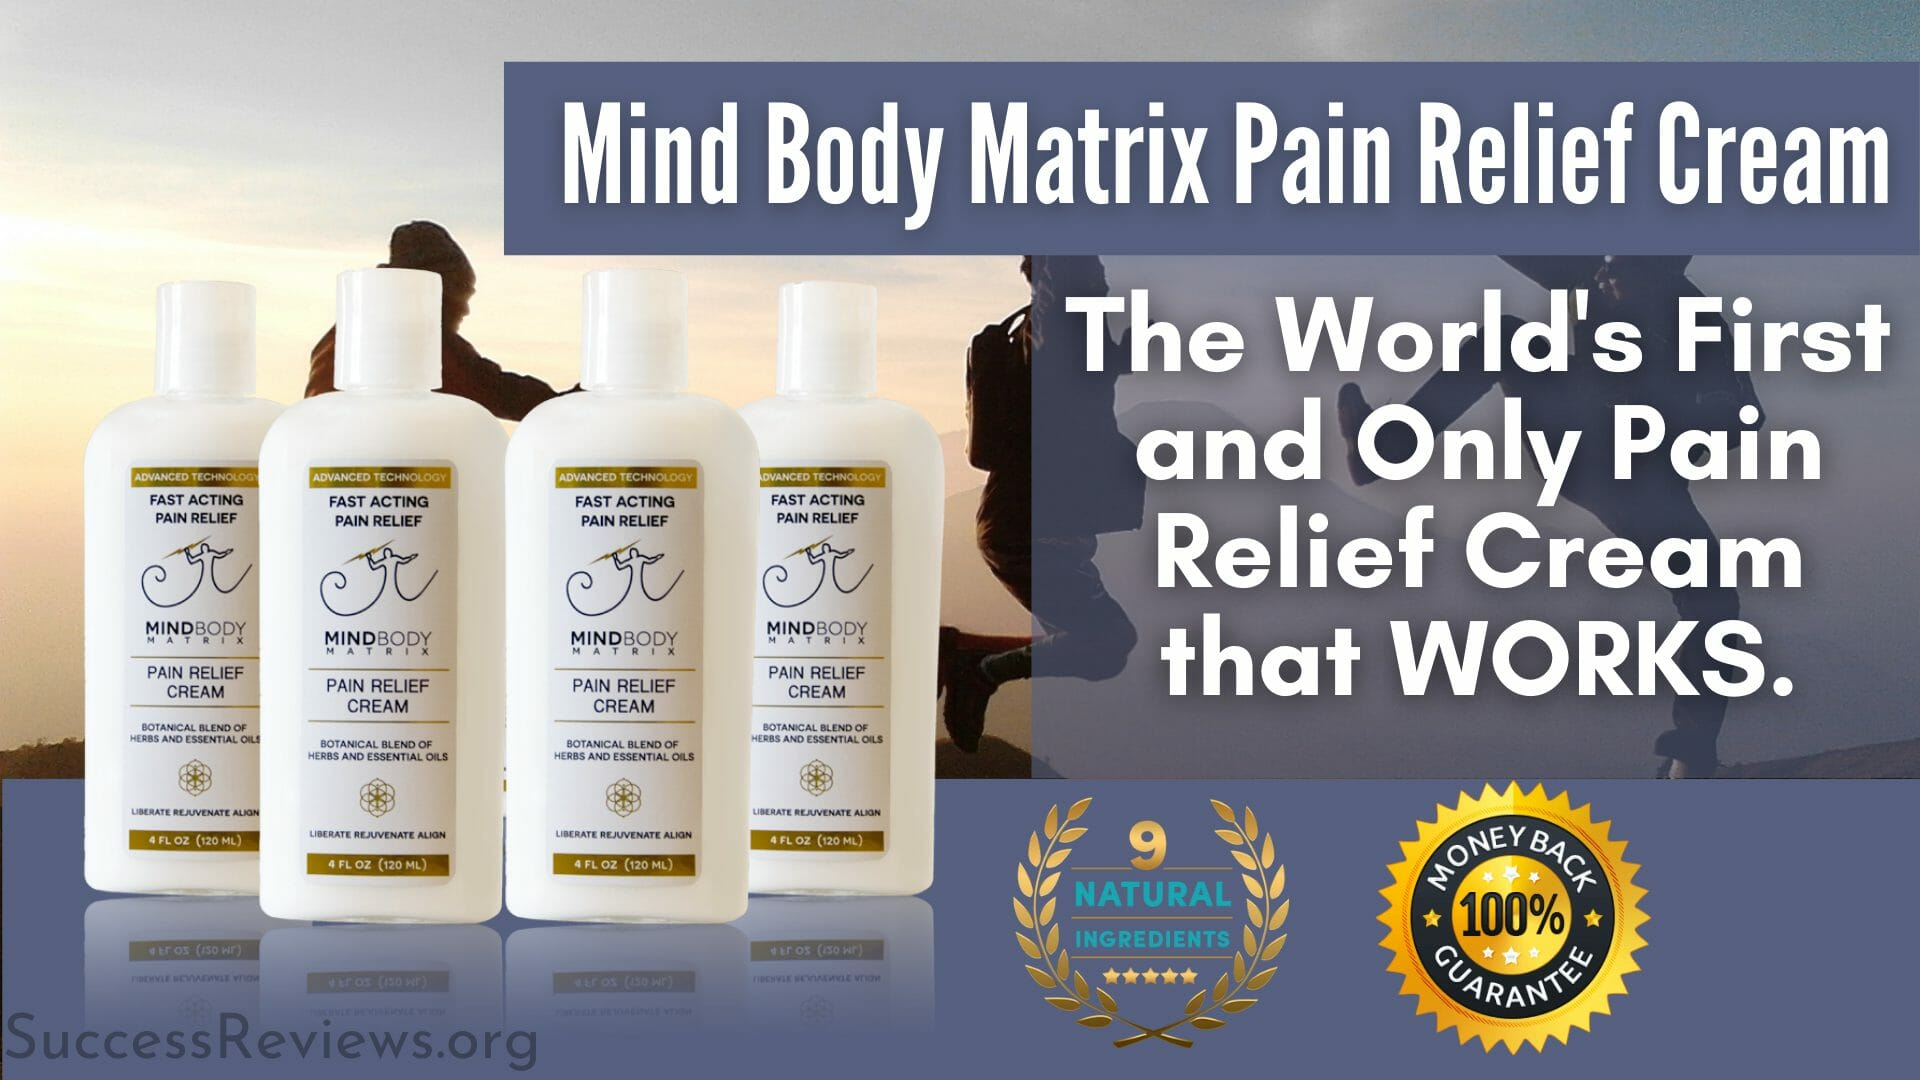 Mind Body Matrix Pain Relief Cream It works